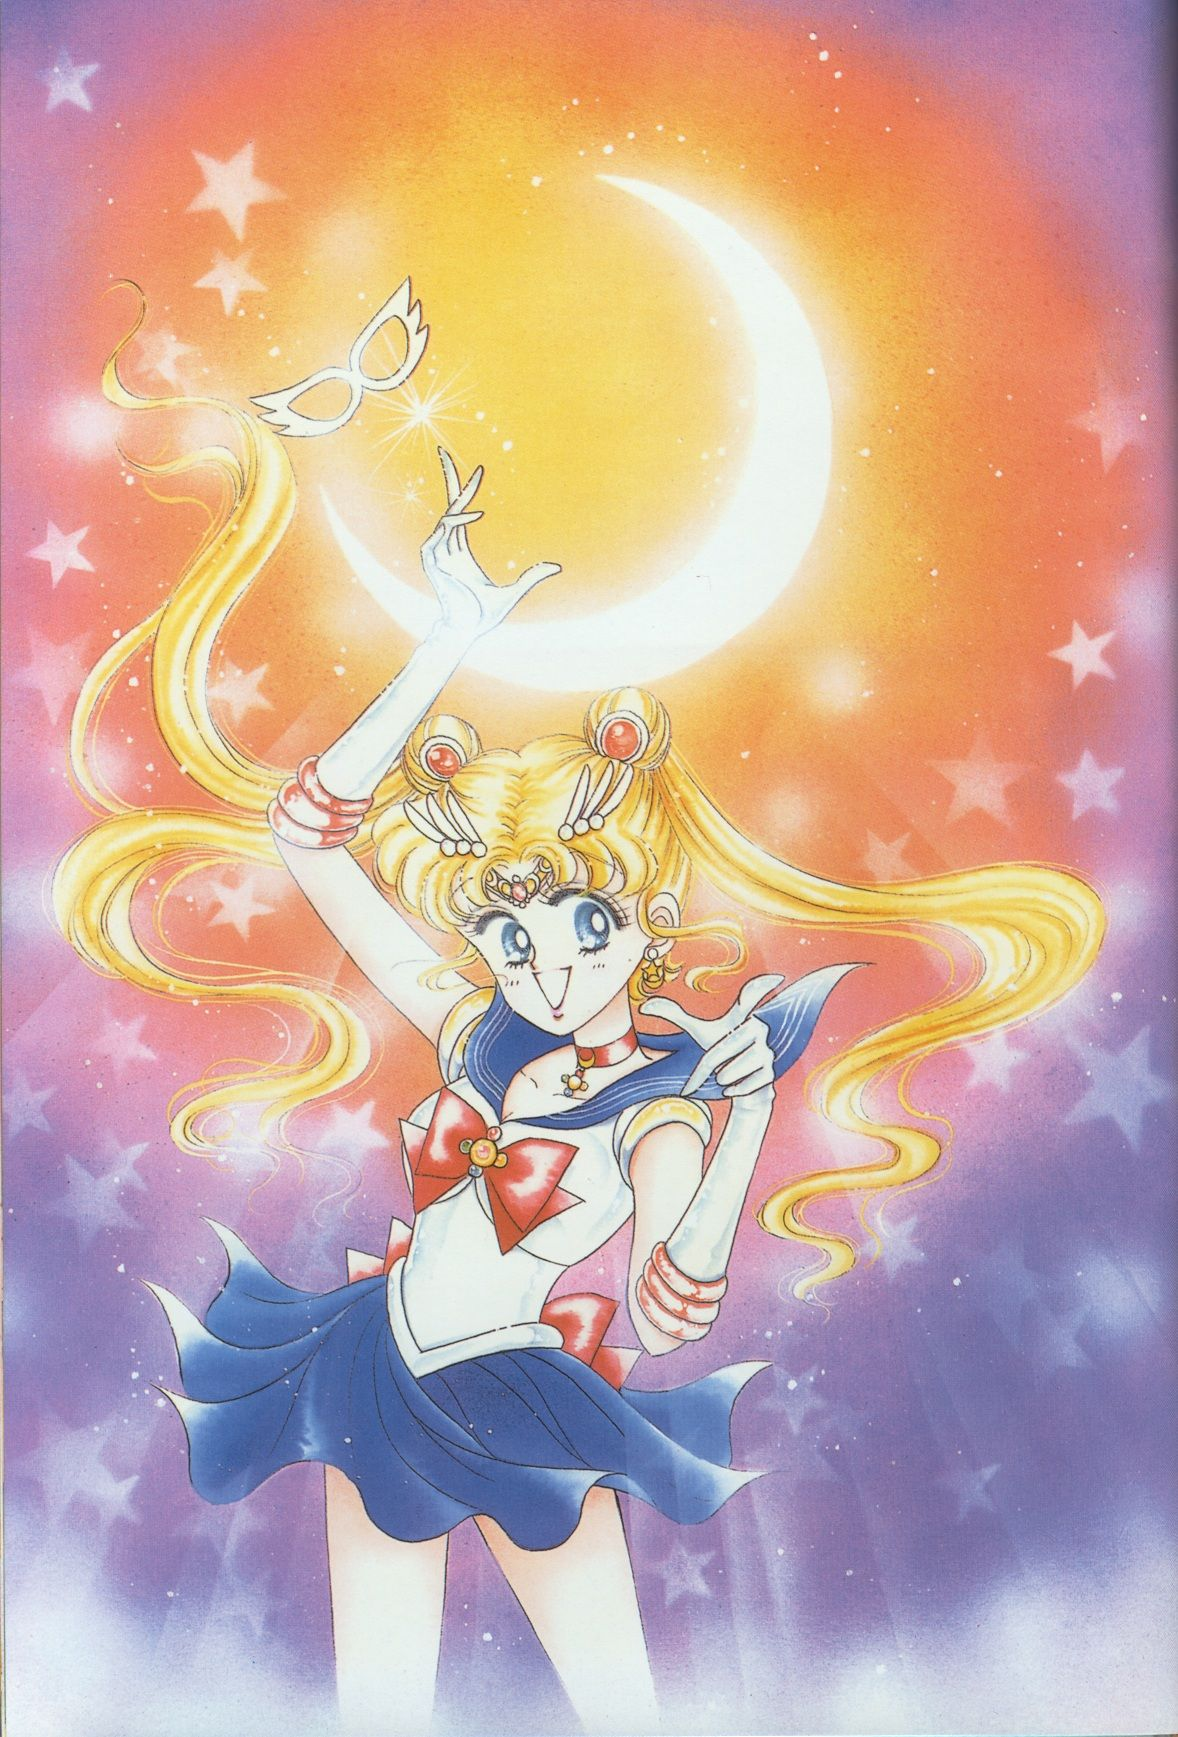 Sailor Moon Original illustration Art Book vol.1 1st Edition Pretty Soldier USED